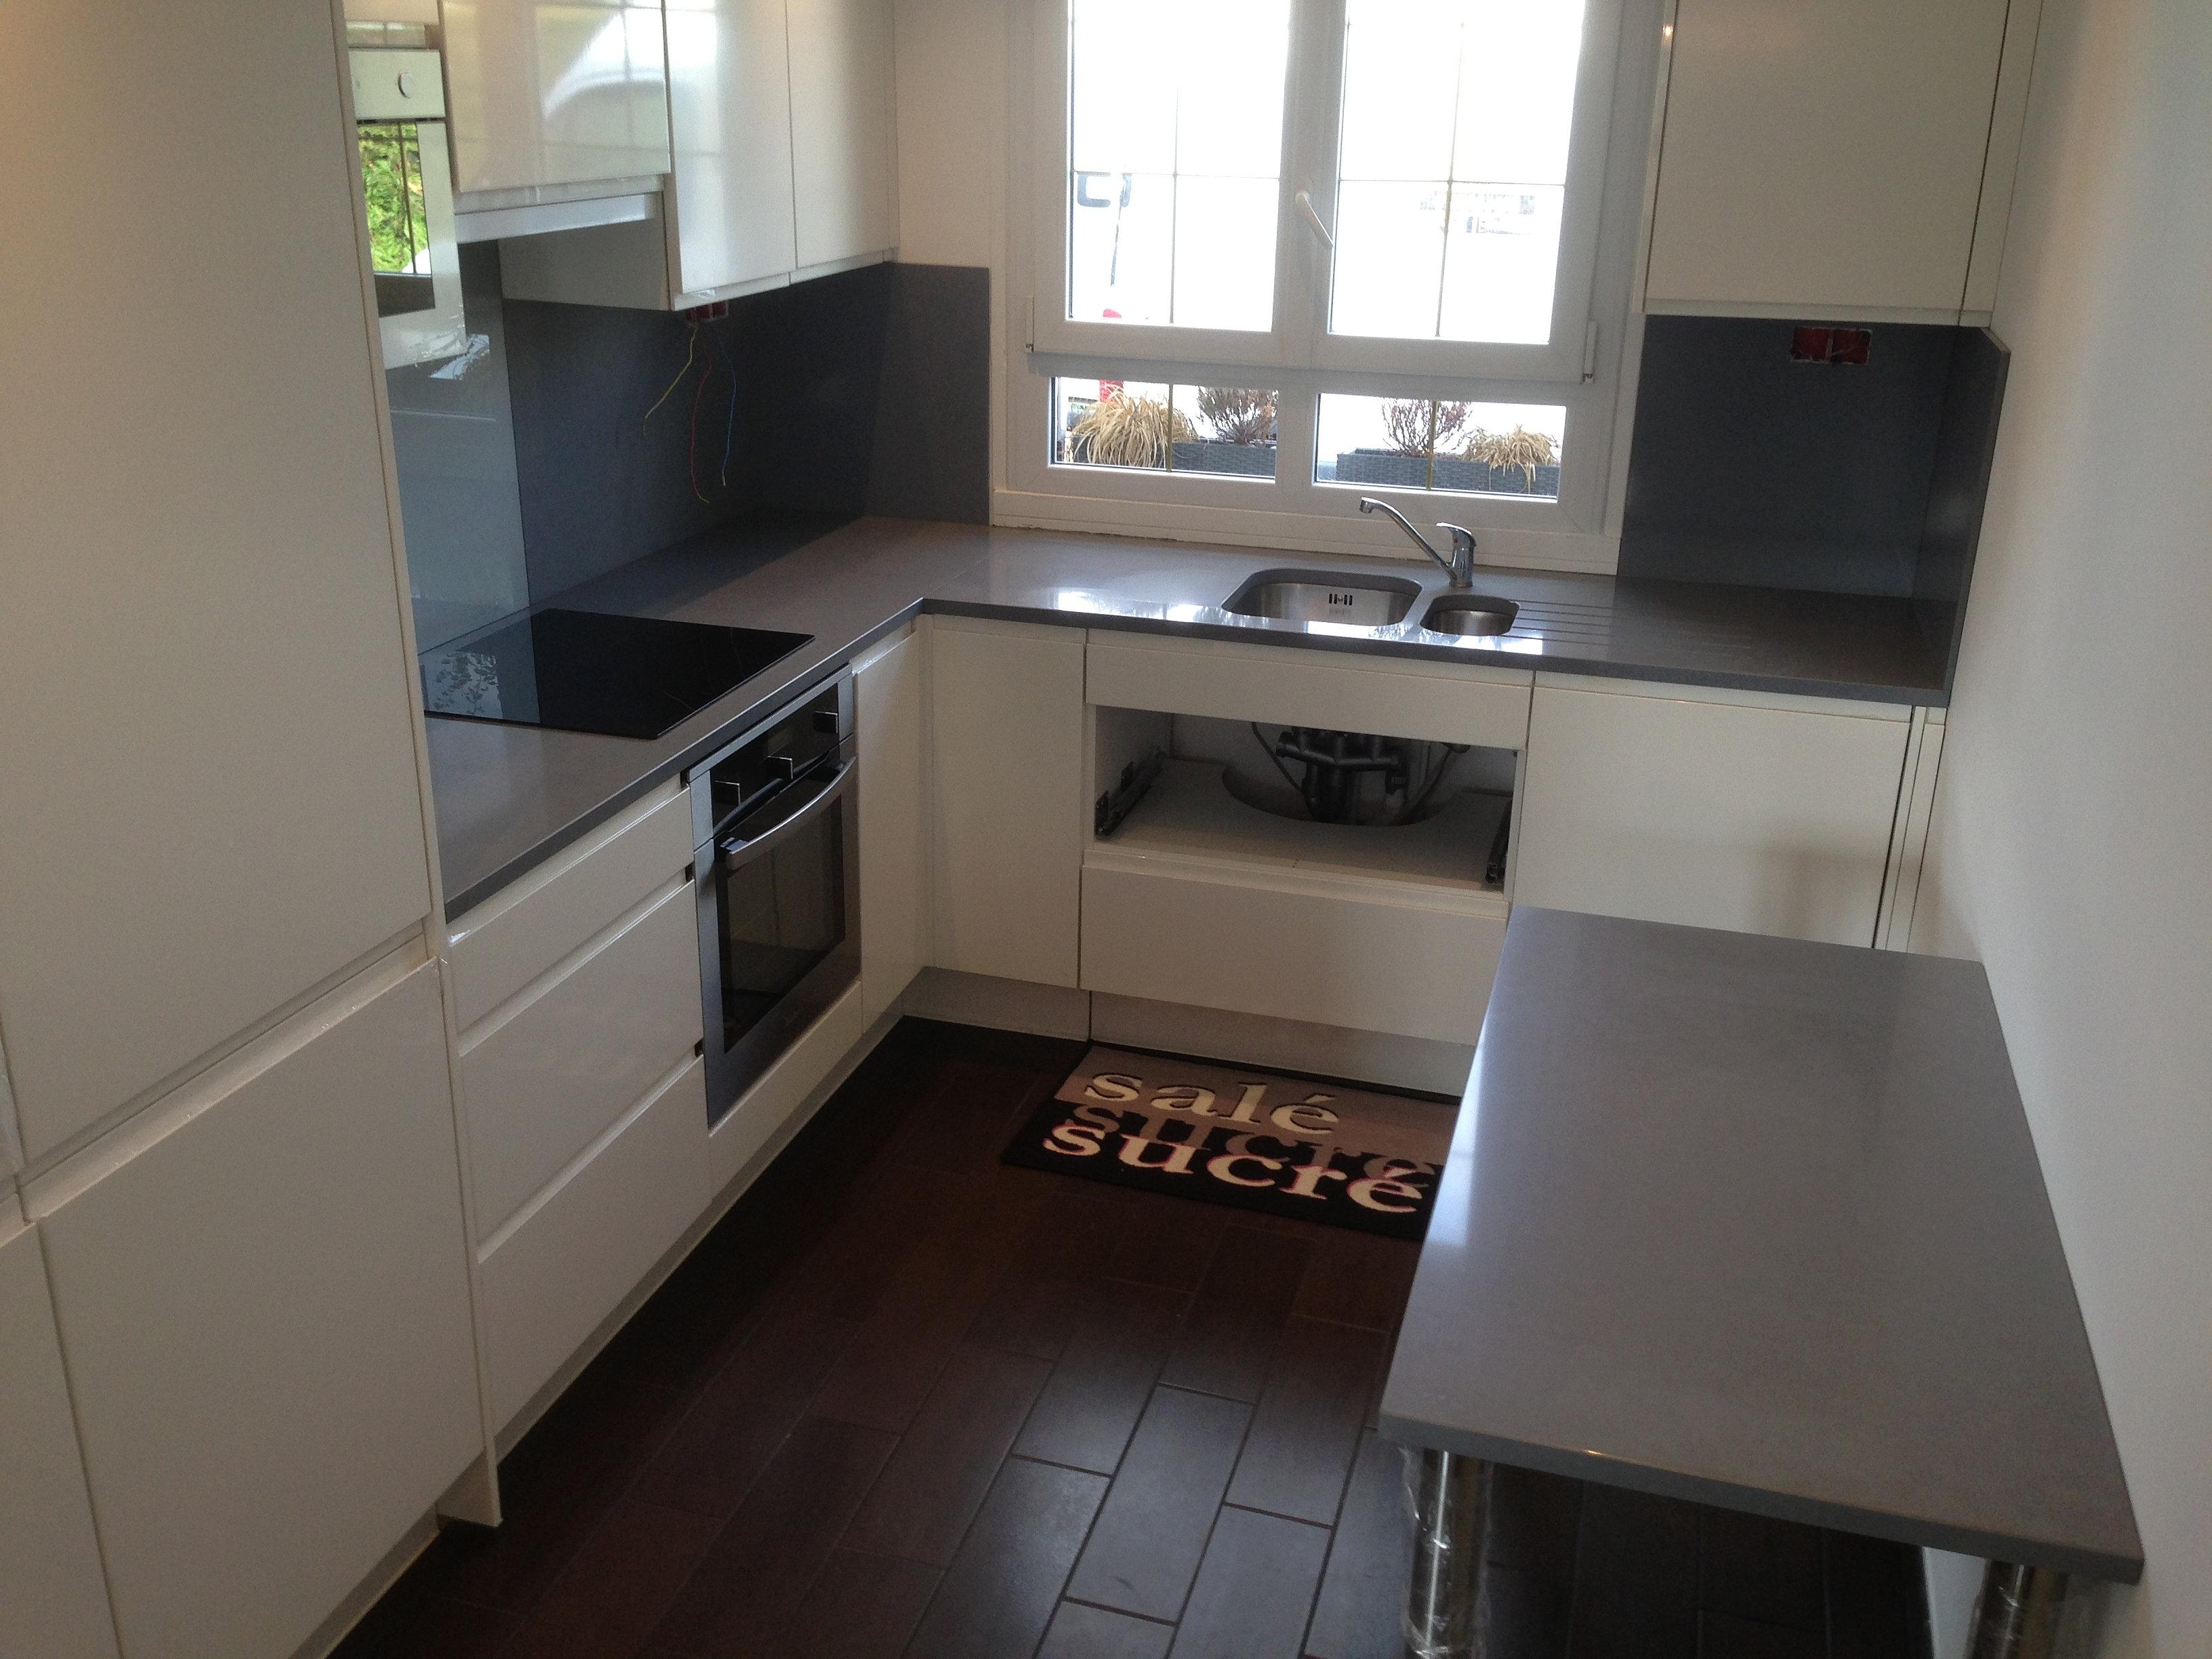 devis plan de travail com paris granit quartz marbre plans de travail en quartz. Black Bedroom Furniture Sets. Home Design Ideas